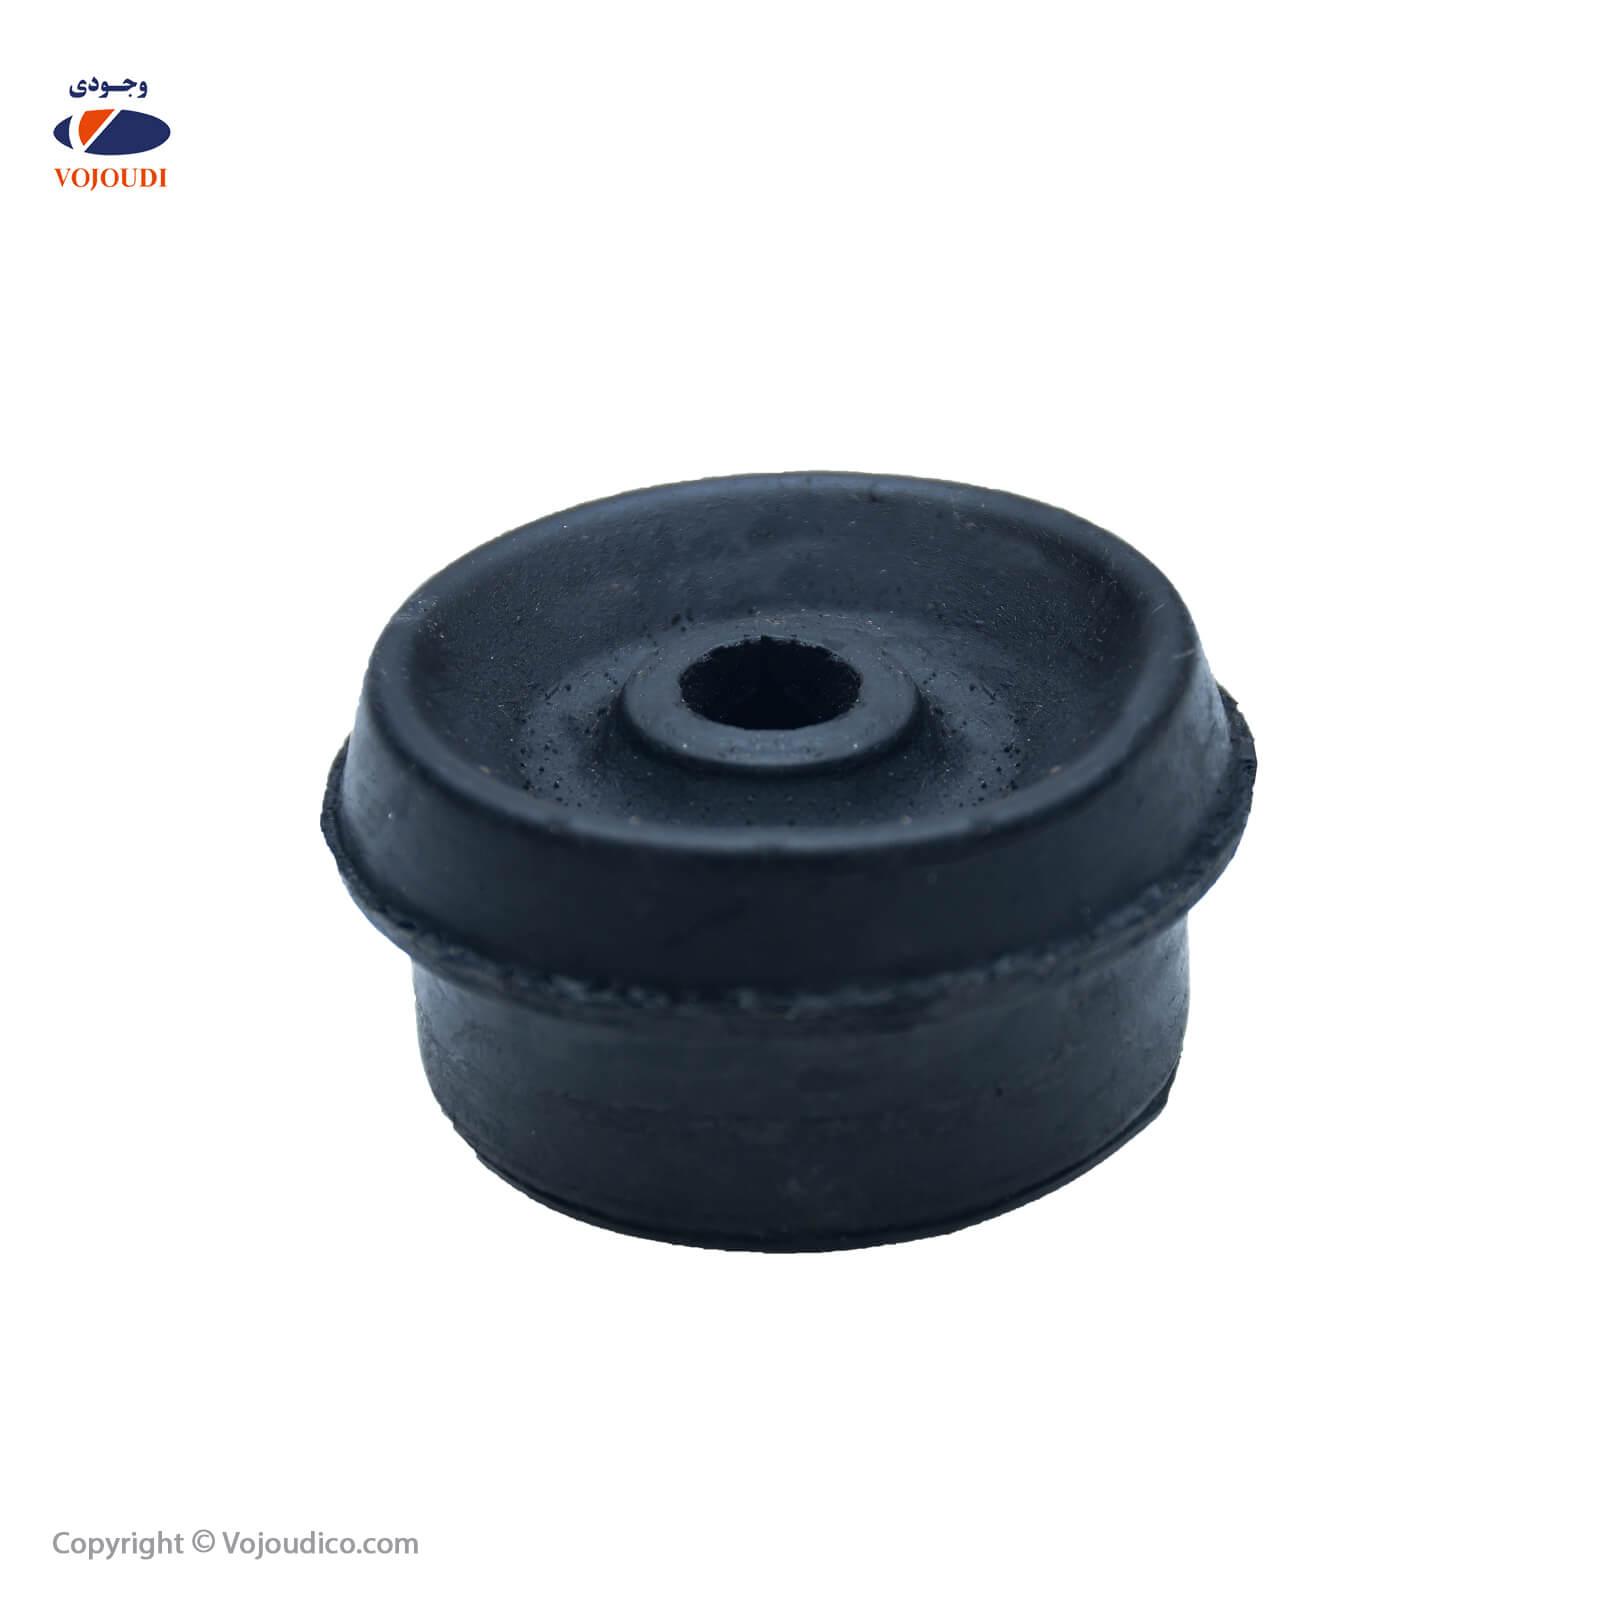 3154 2 - بوش دور پلاستيكی اكسل عقب وجودی کد 3154 مناسب برای 405-GL-GLX ، تعداد بسته : 25 عدد